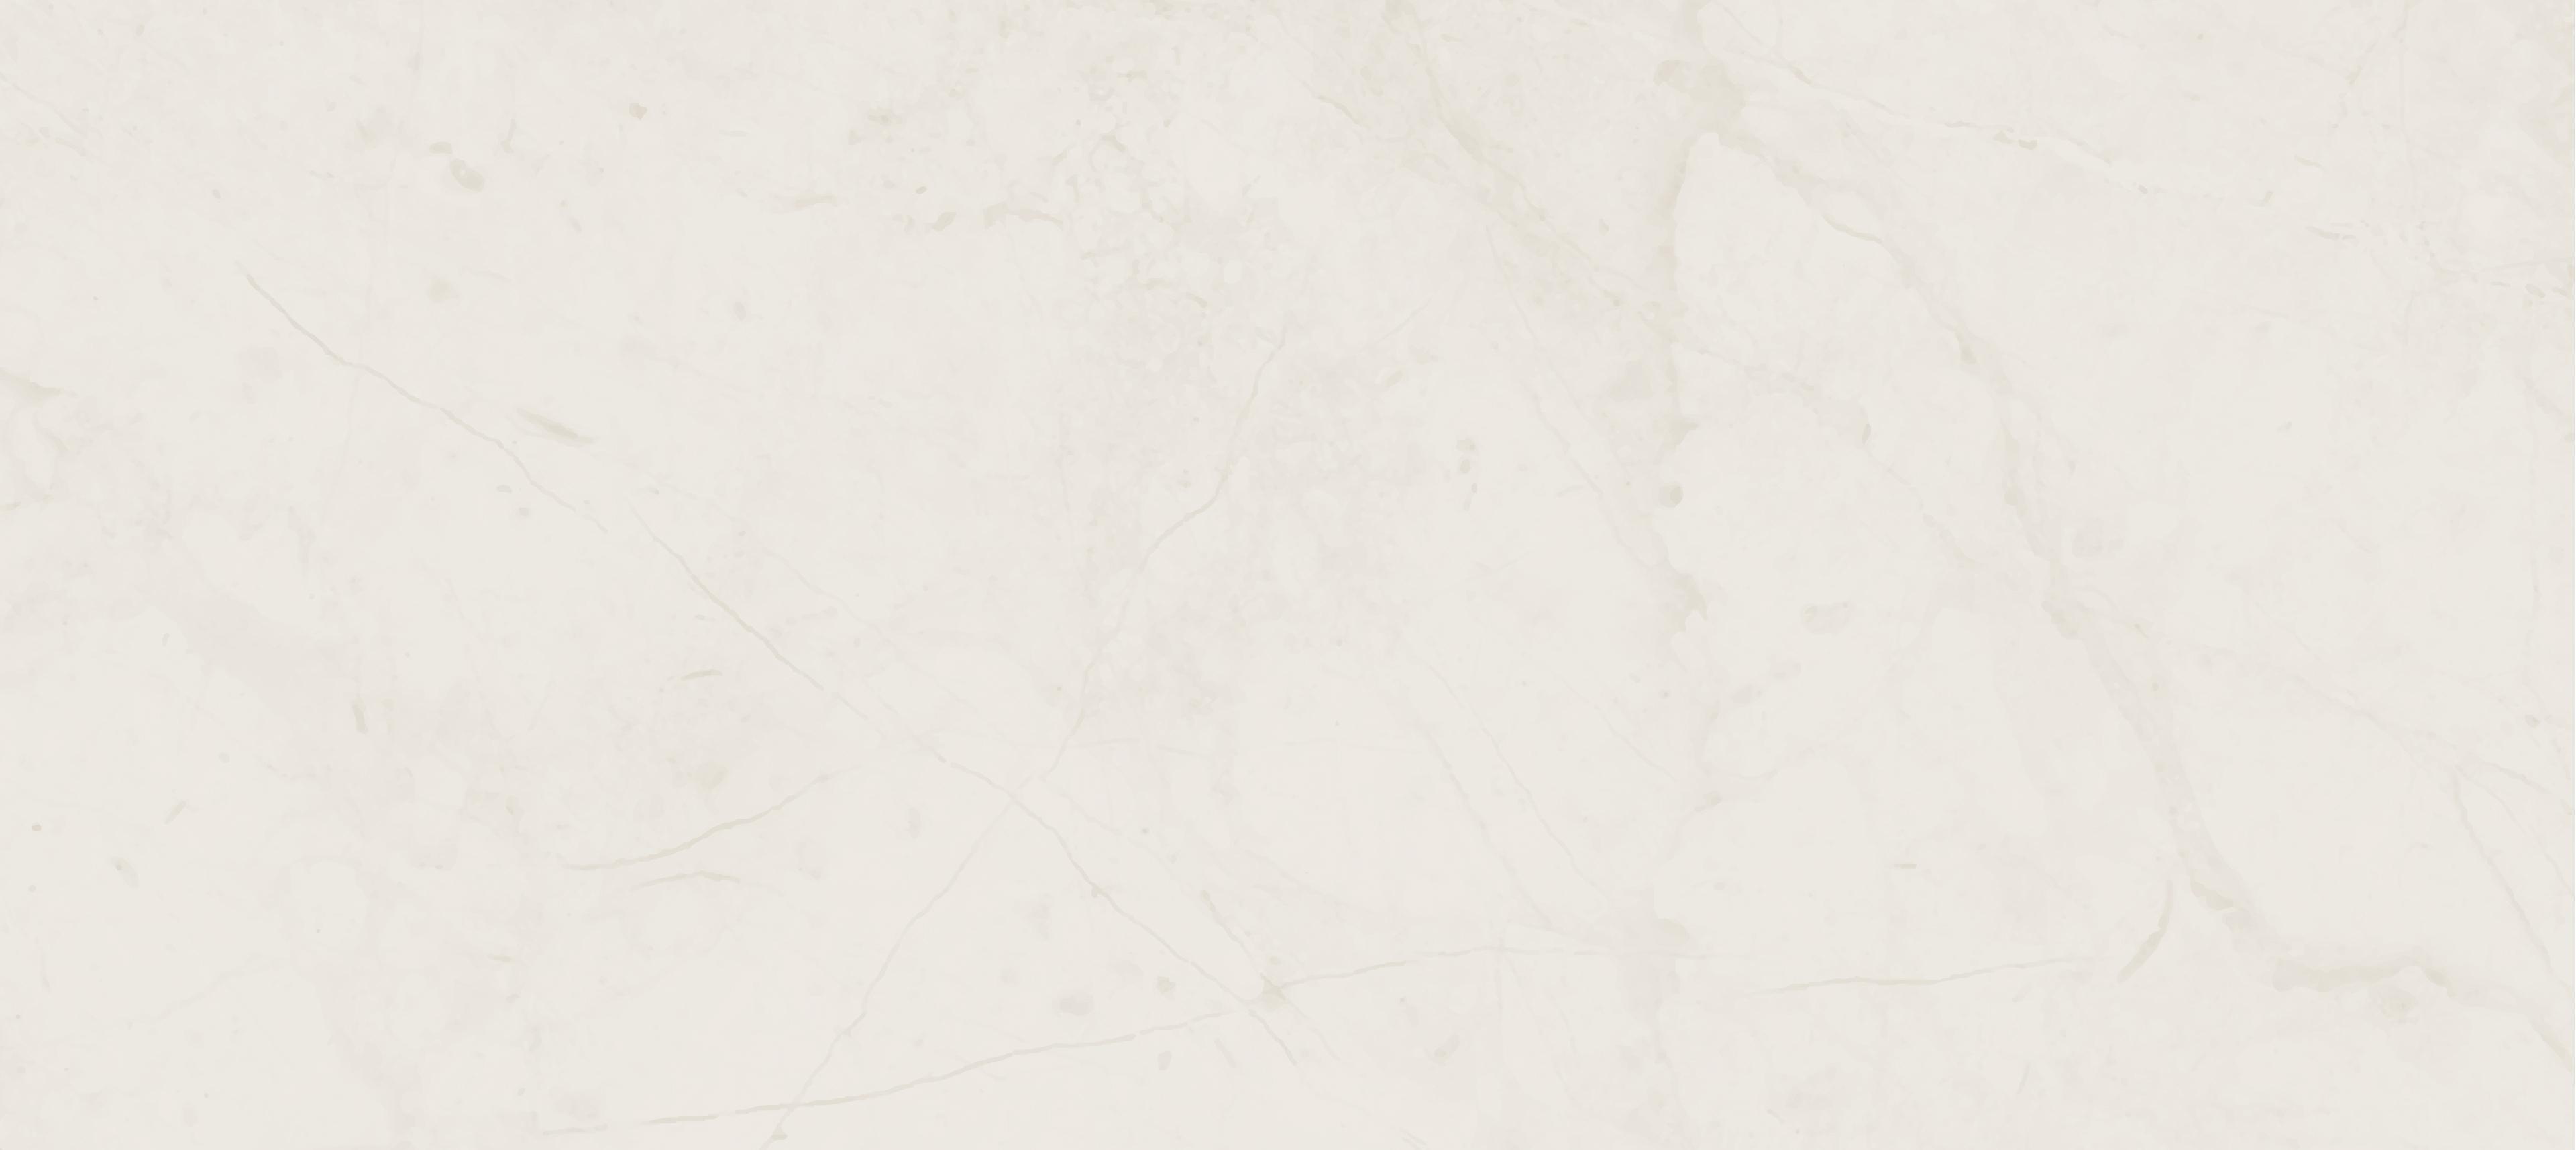 Apex background texture